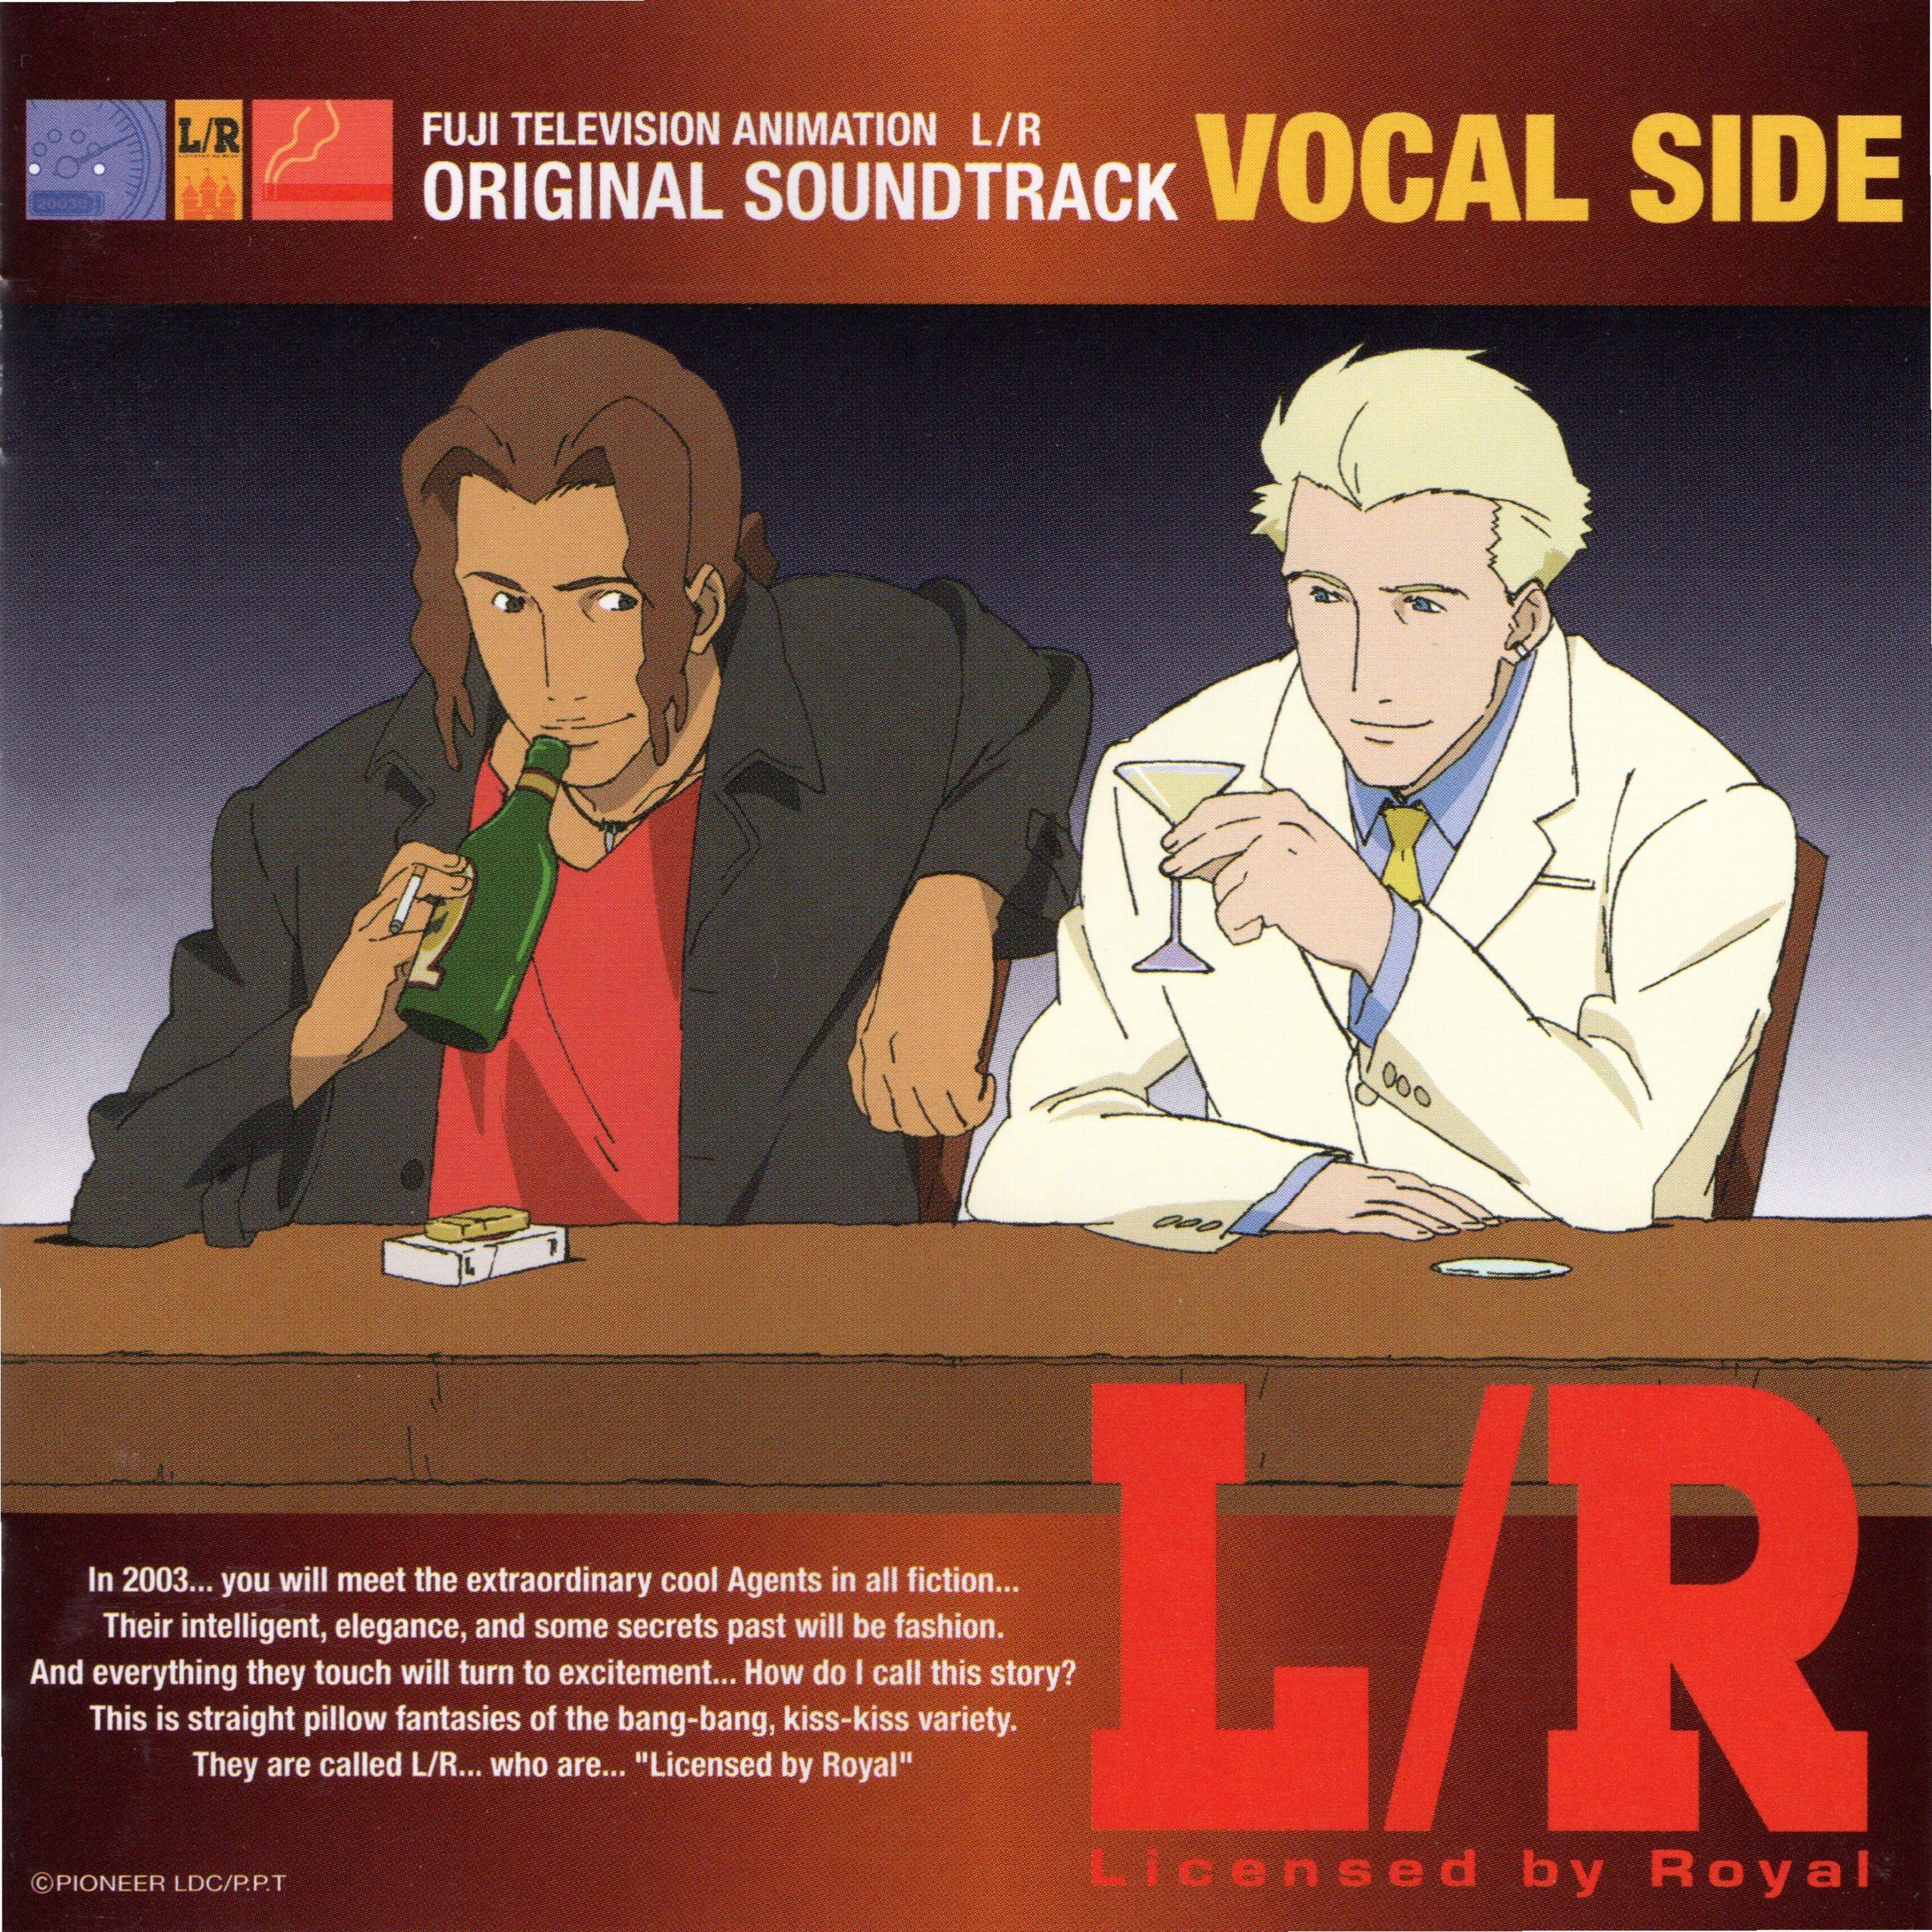 L/R オリジナルサウンドトラックVOCAL SIDE Soundtrack